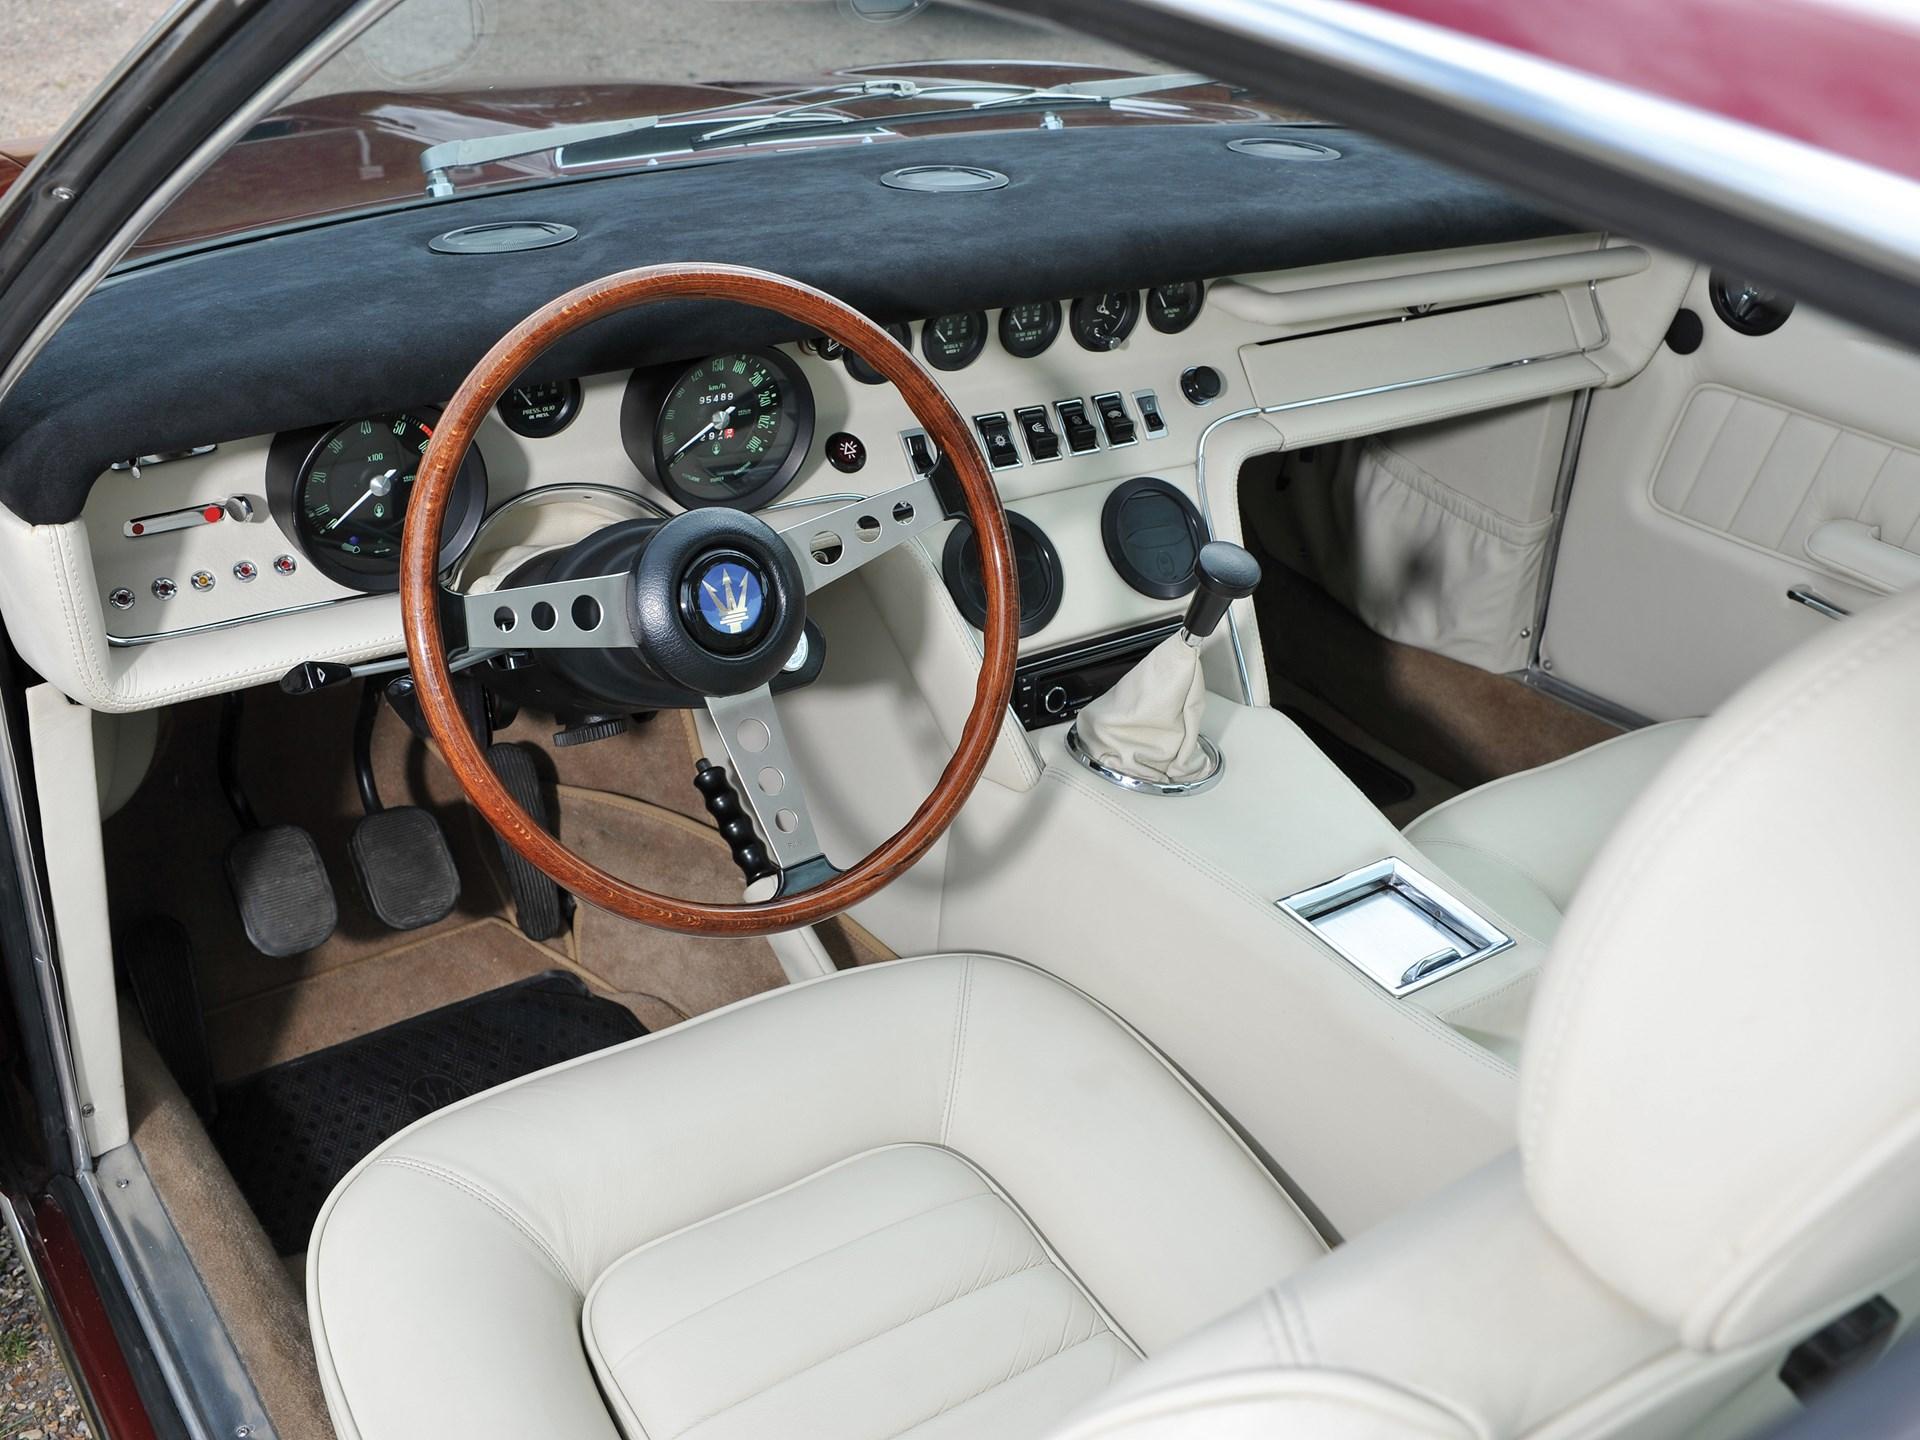 1970 Maserati Ghibli SS 4.9 Coupé by Ghia